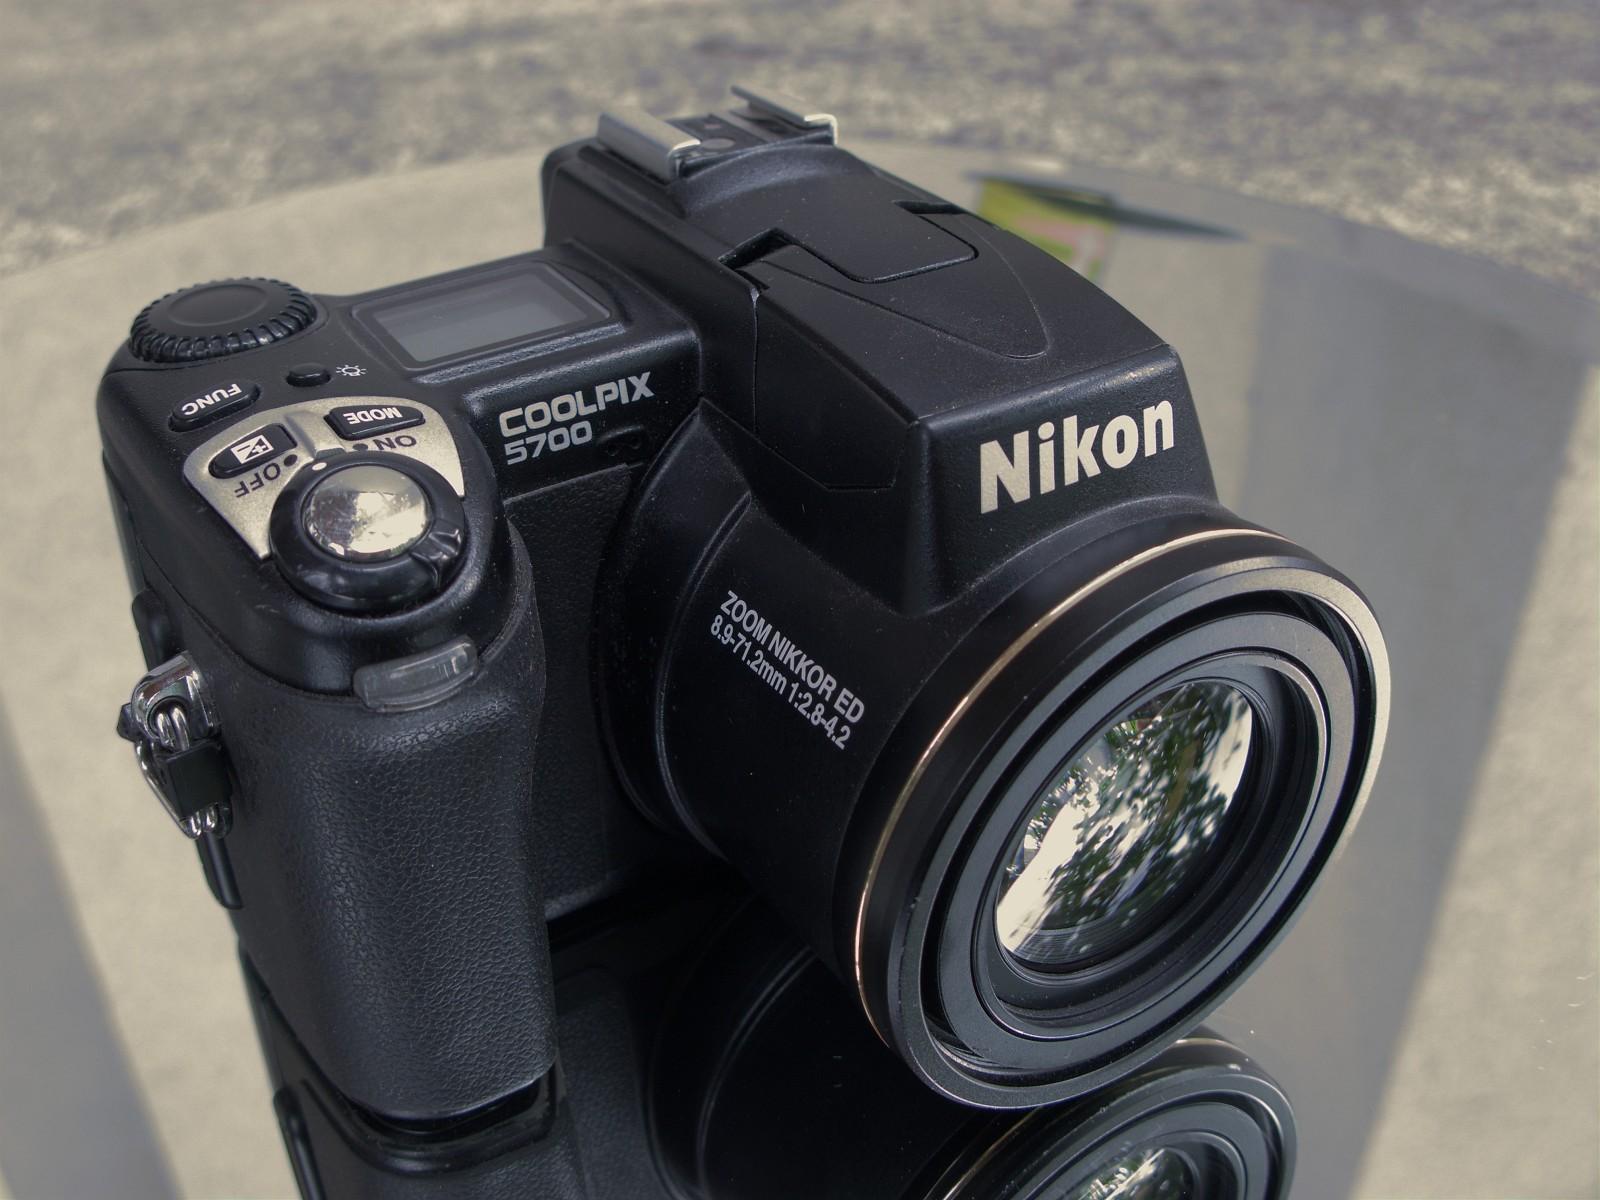 Nikon Coolpix 5700 - Wikipedia